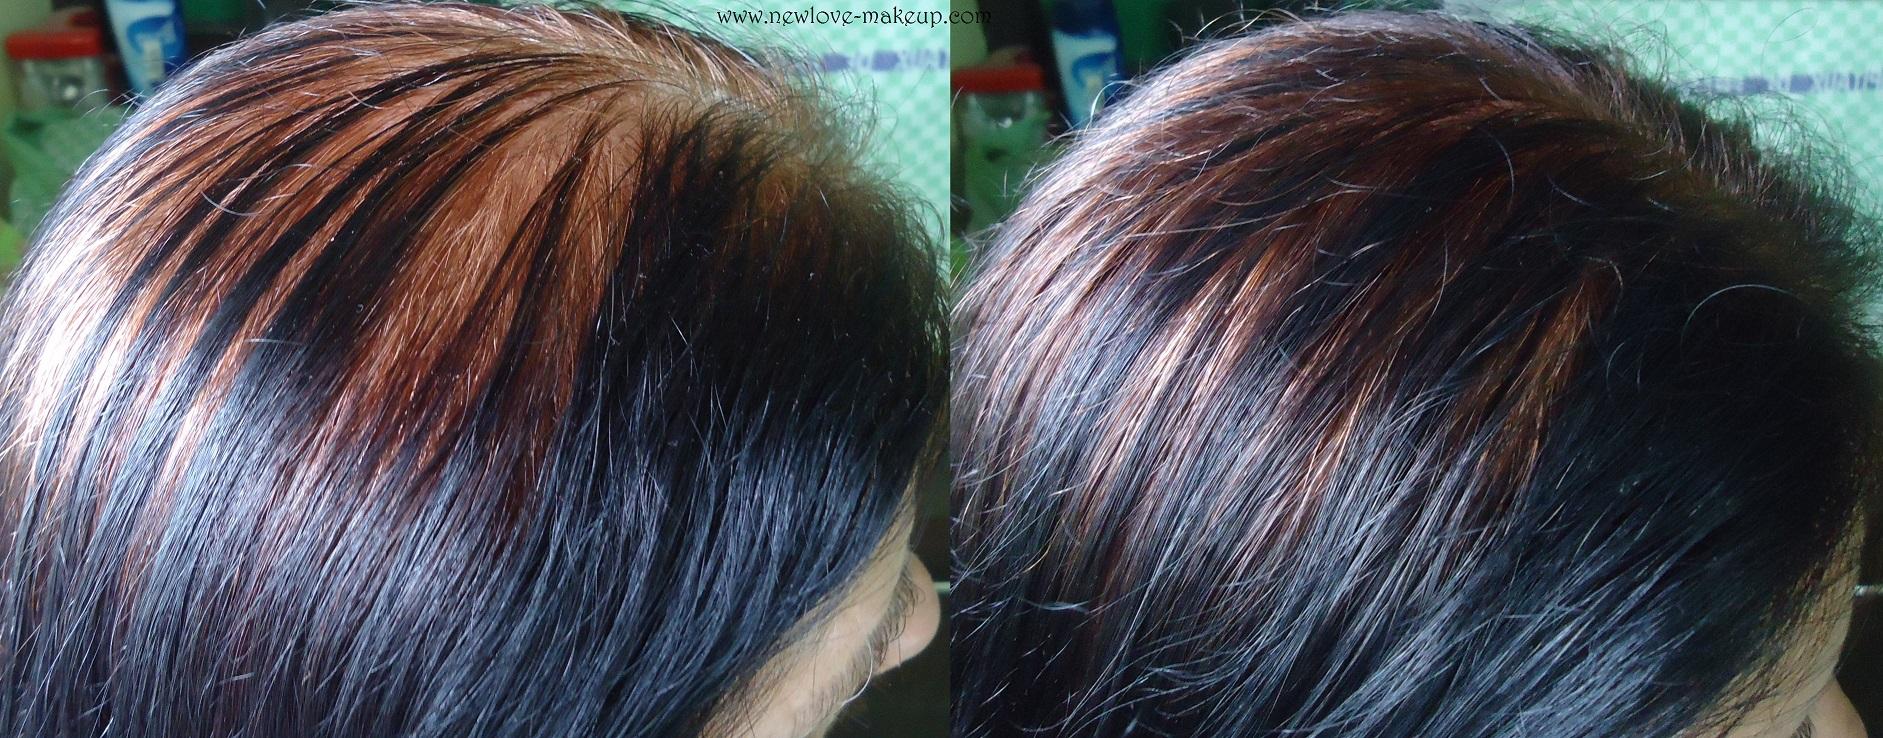 Godrej Nupur Coconut Henna Crme Colour ReviewDemo New